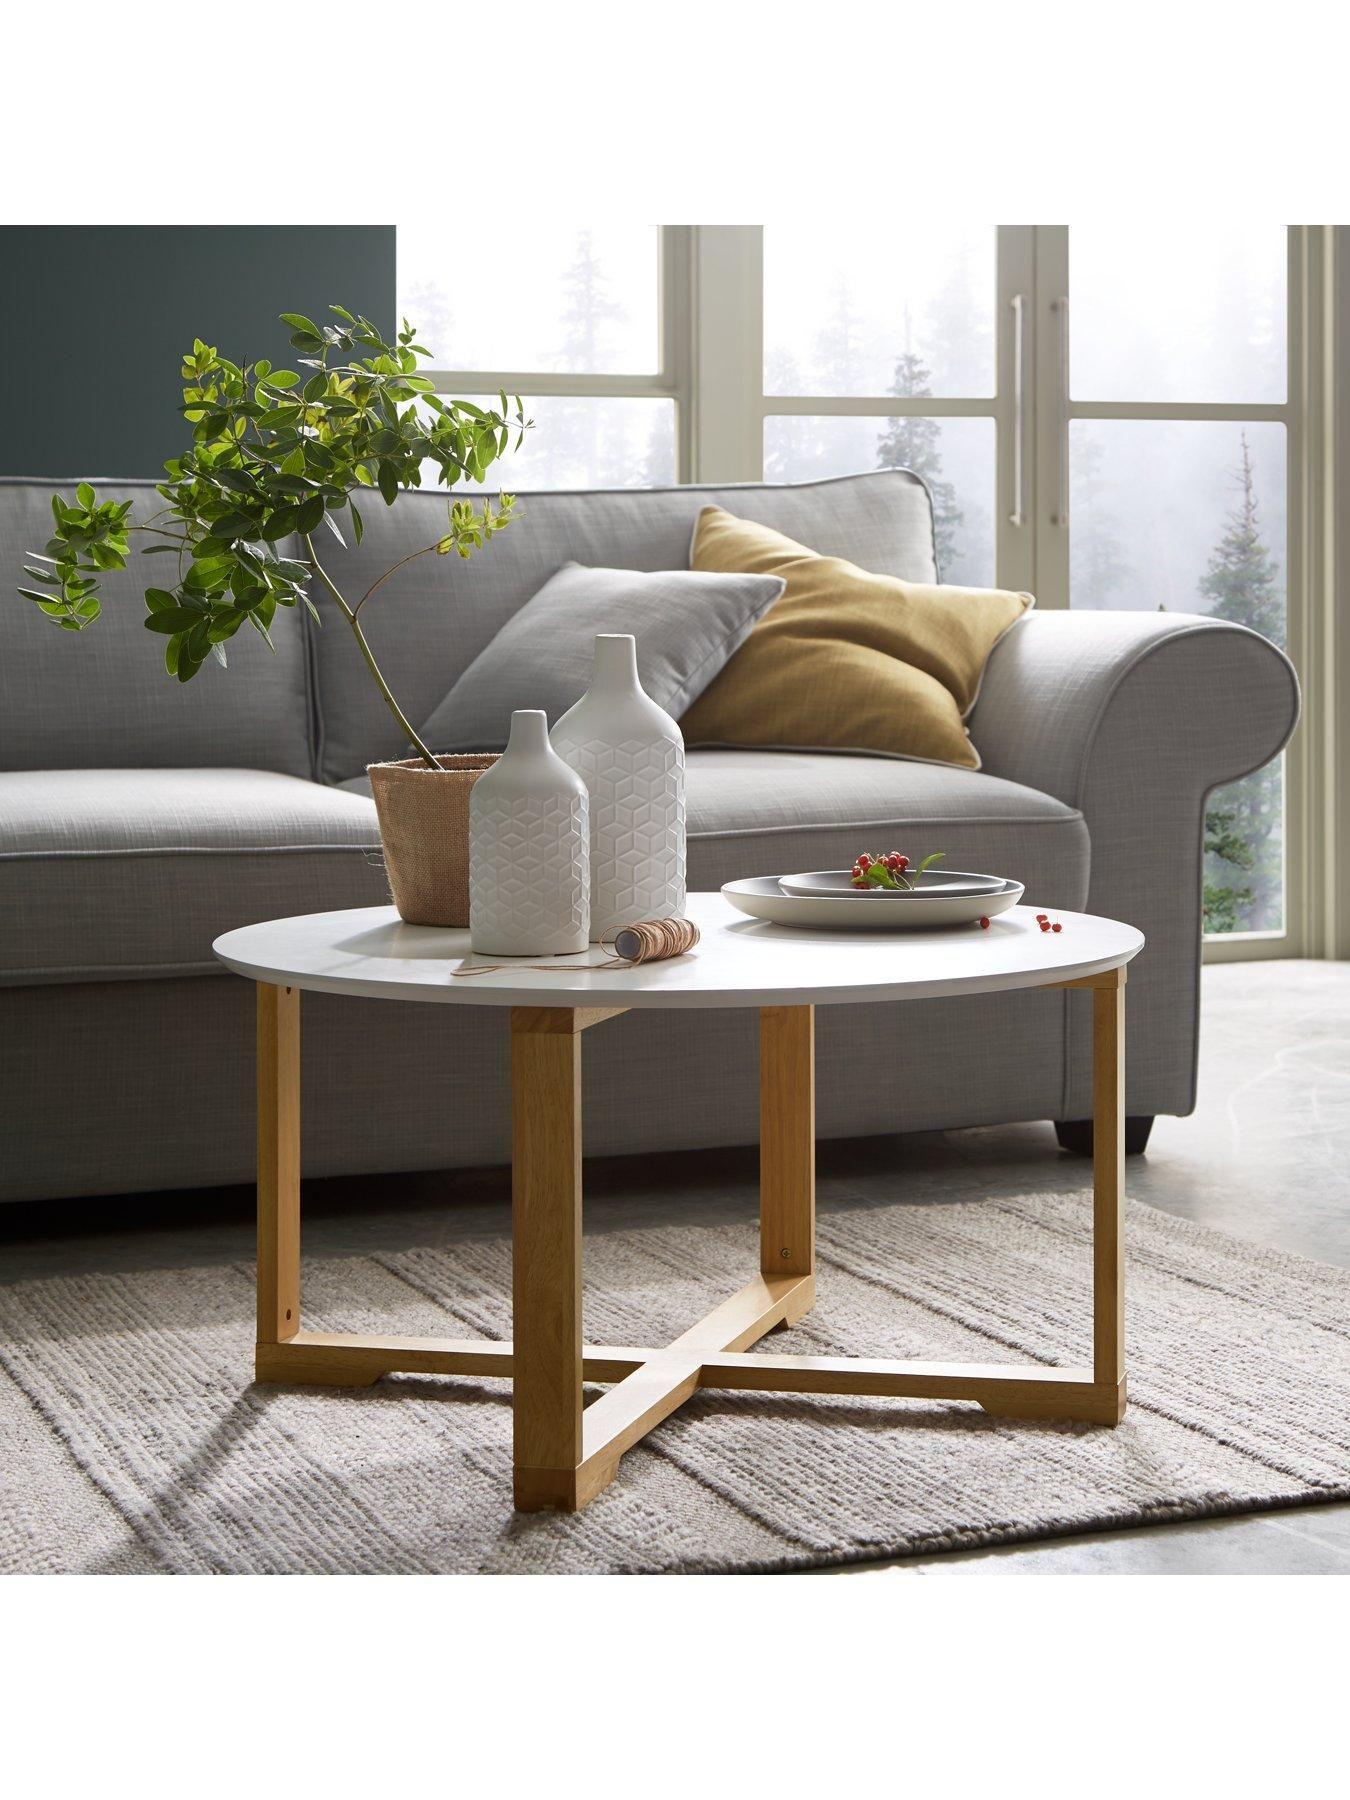 Round Coffee Table Round Coffee Table White Round Coffee Table